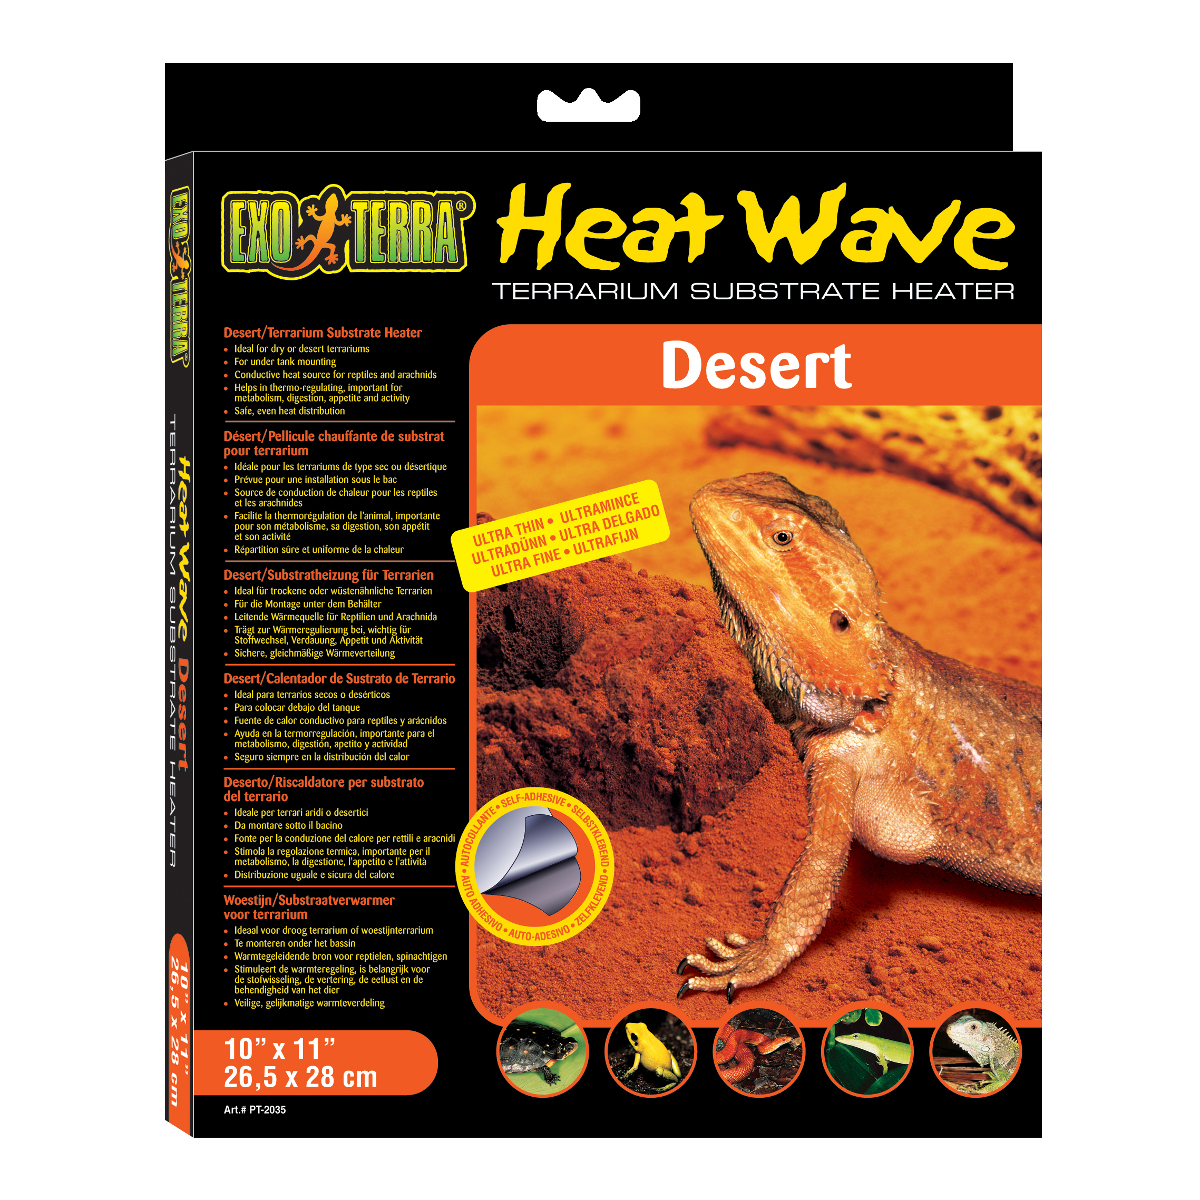 Deska topná EXO TERRA Heat Wave Desert střední 16 W